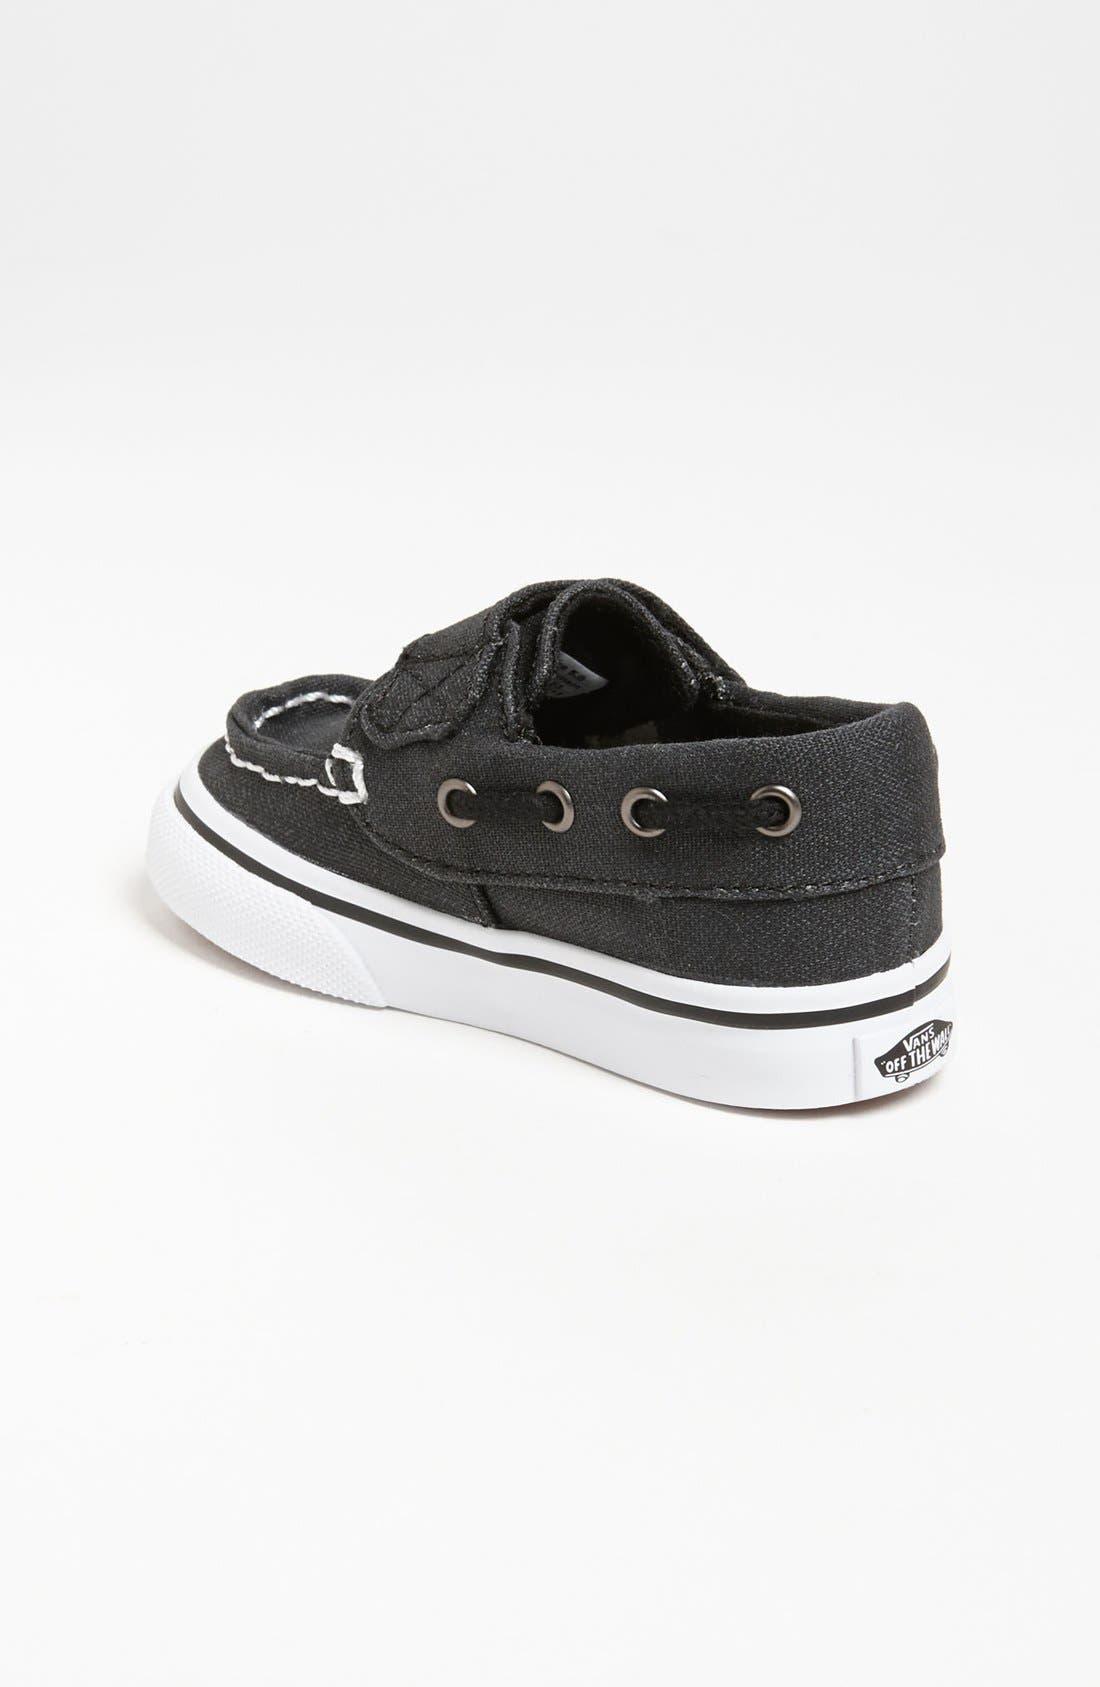 Alternate Image 2  - Vans 'Zapato Del Barco' Sneaker (Baby, Walker & Toddler)